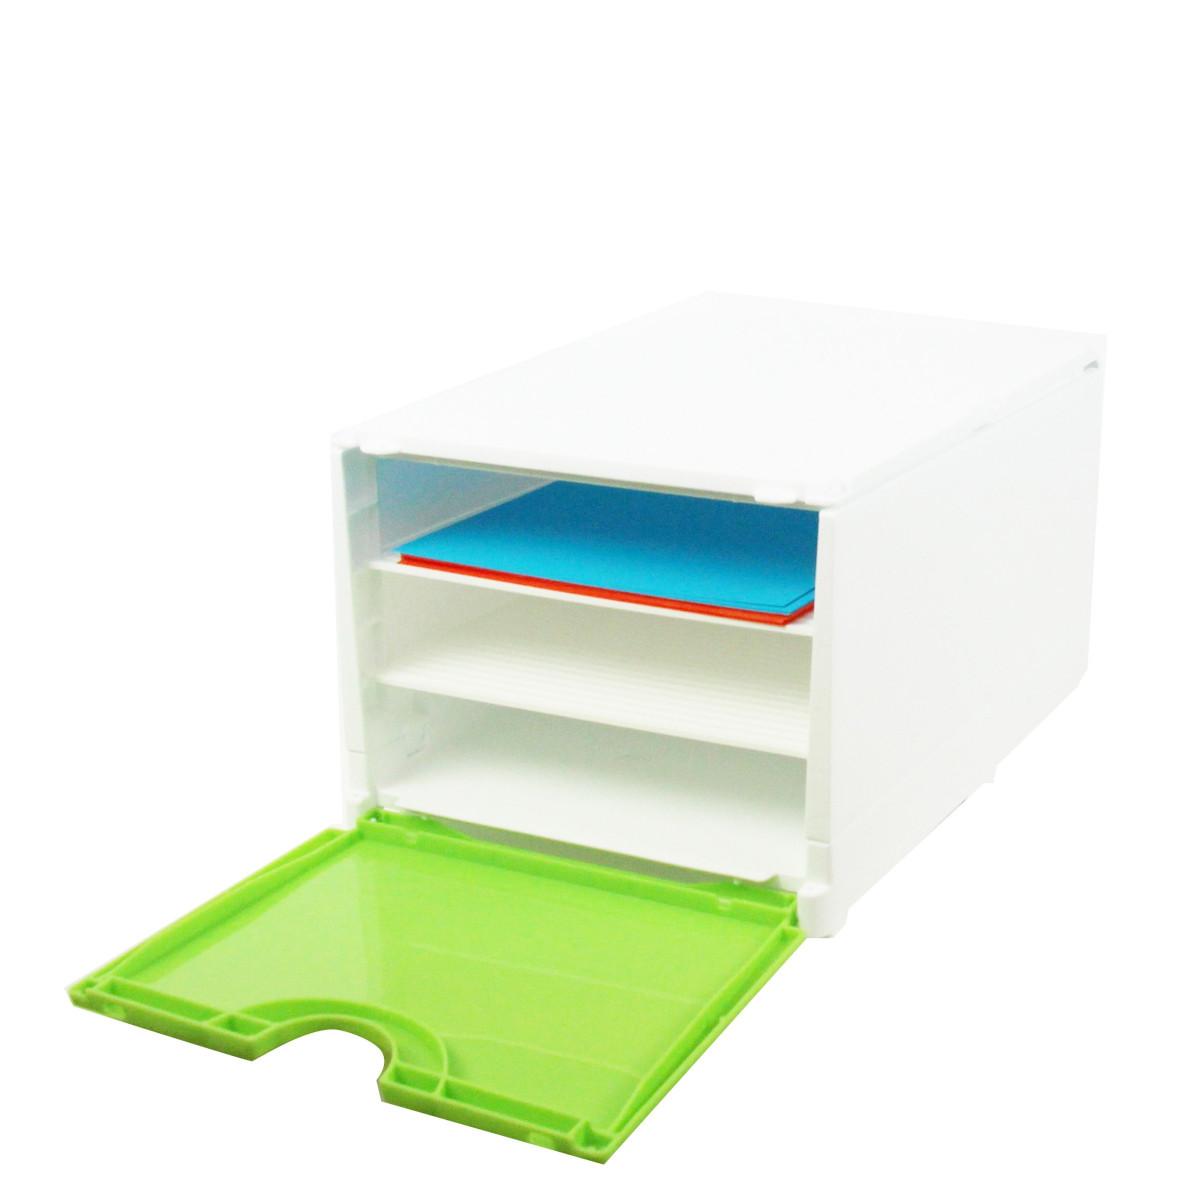 module de classement vert rangement bureau. Black Bedroom Furniture Sets. Home Design Ideas